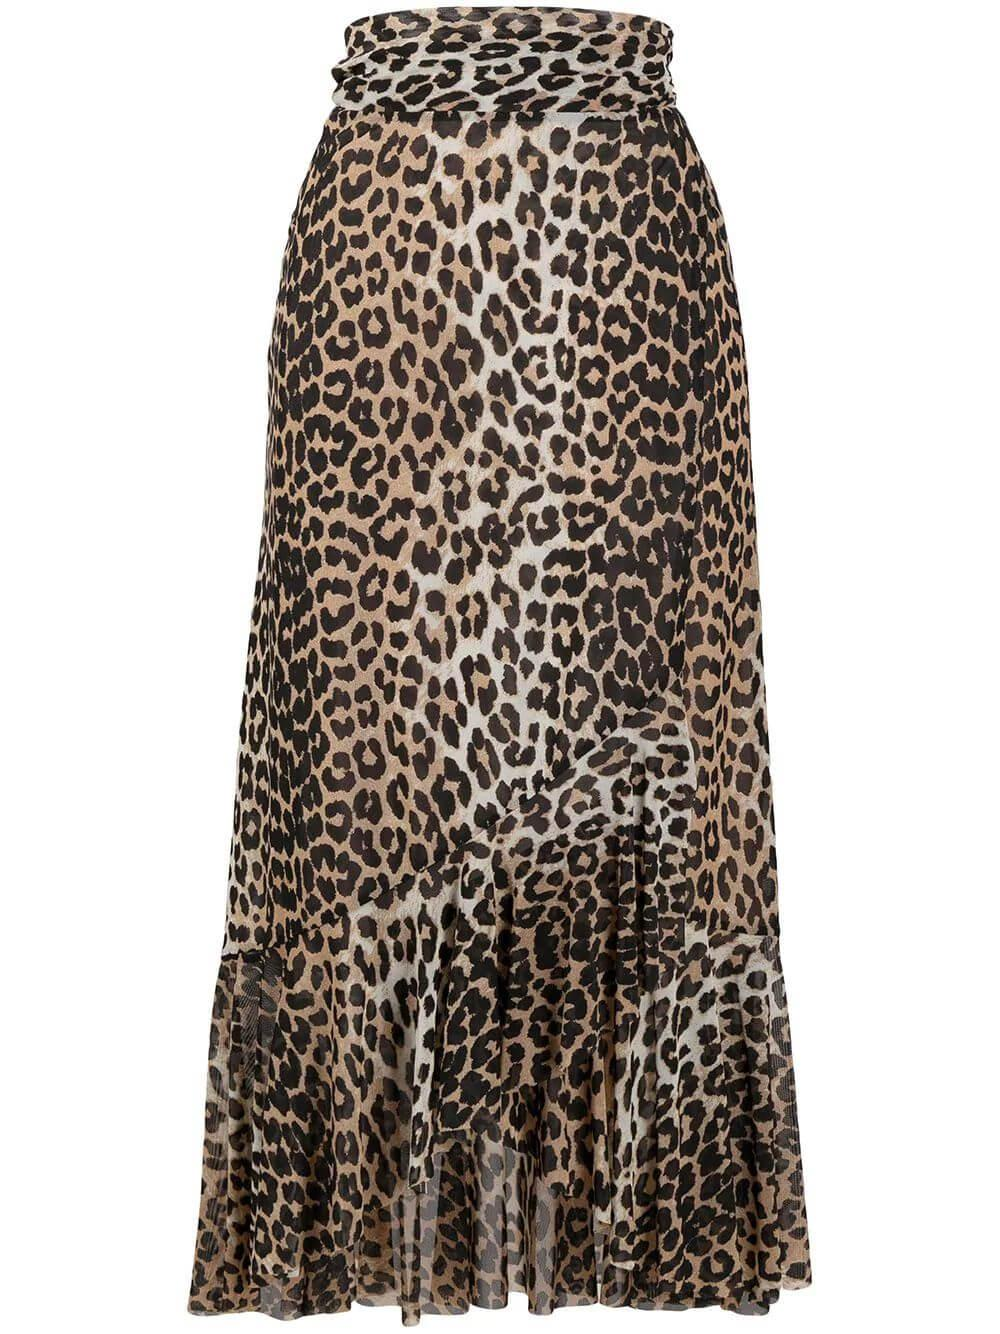 Leopard Print Mesh Wrap Skirt